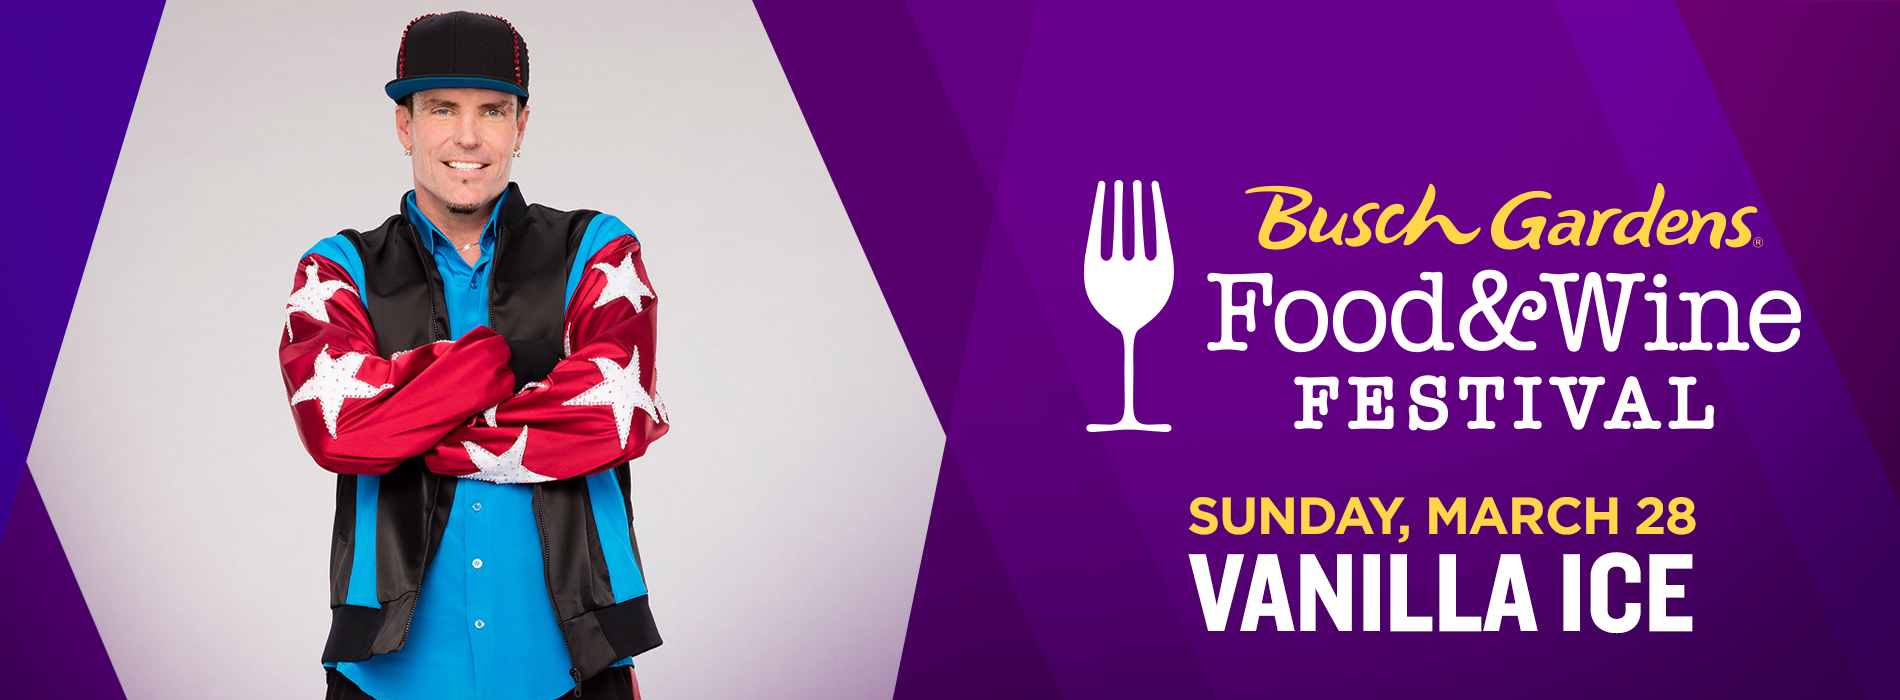 Vanilla Ice at Busch Gardens Tampa Bay Food & Wine Festival | Sunday, March 28